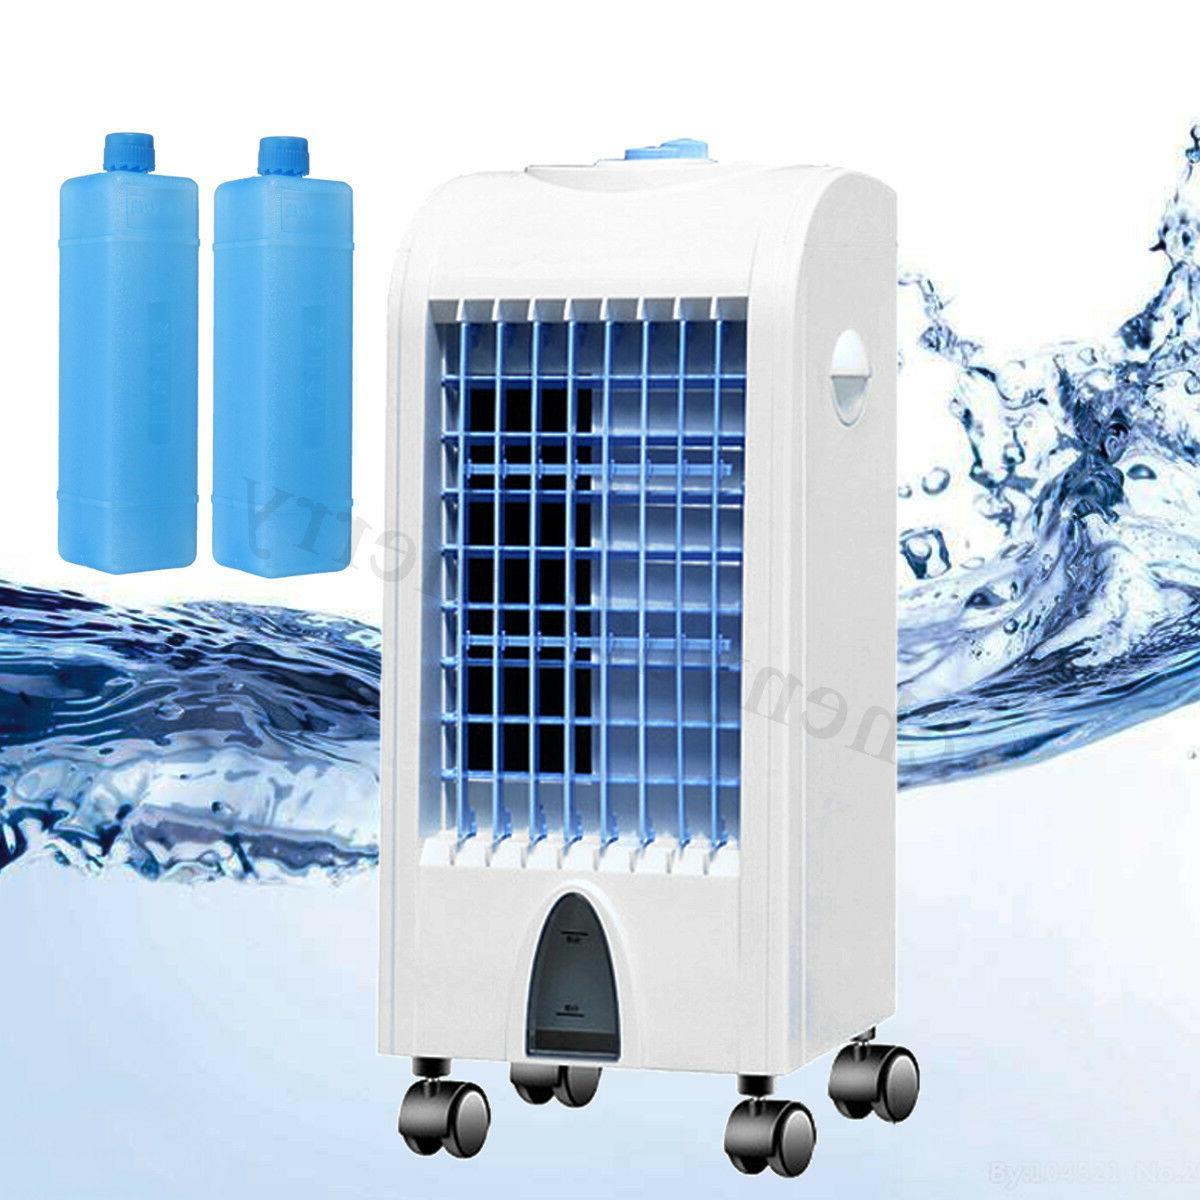 5l evaporative air cooler fan remote control